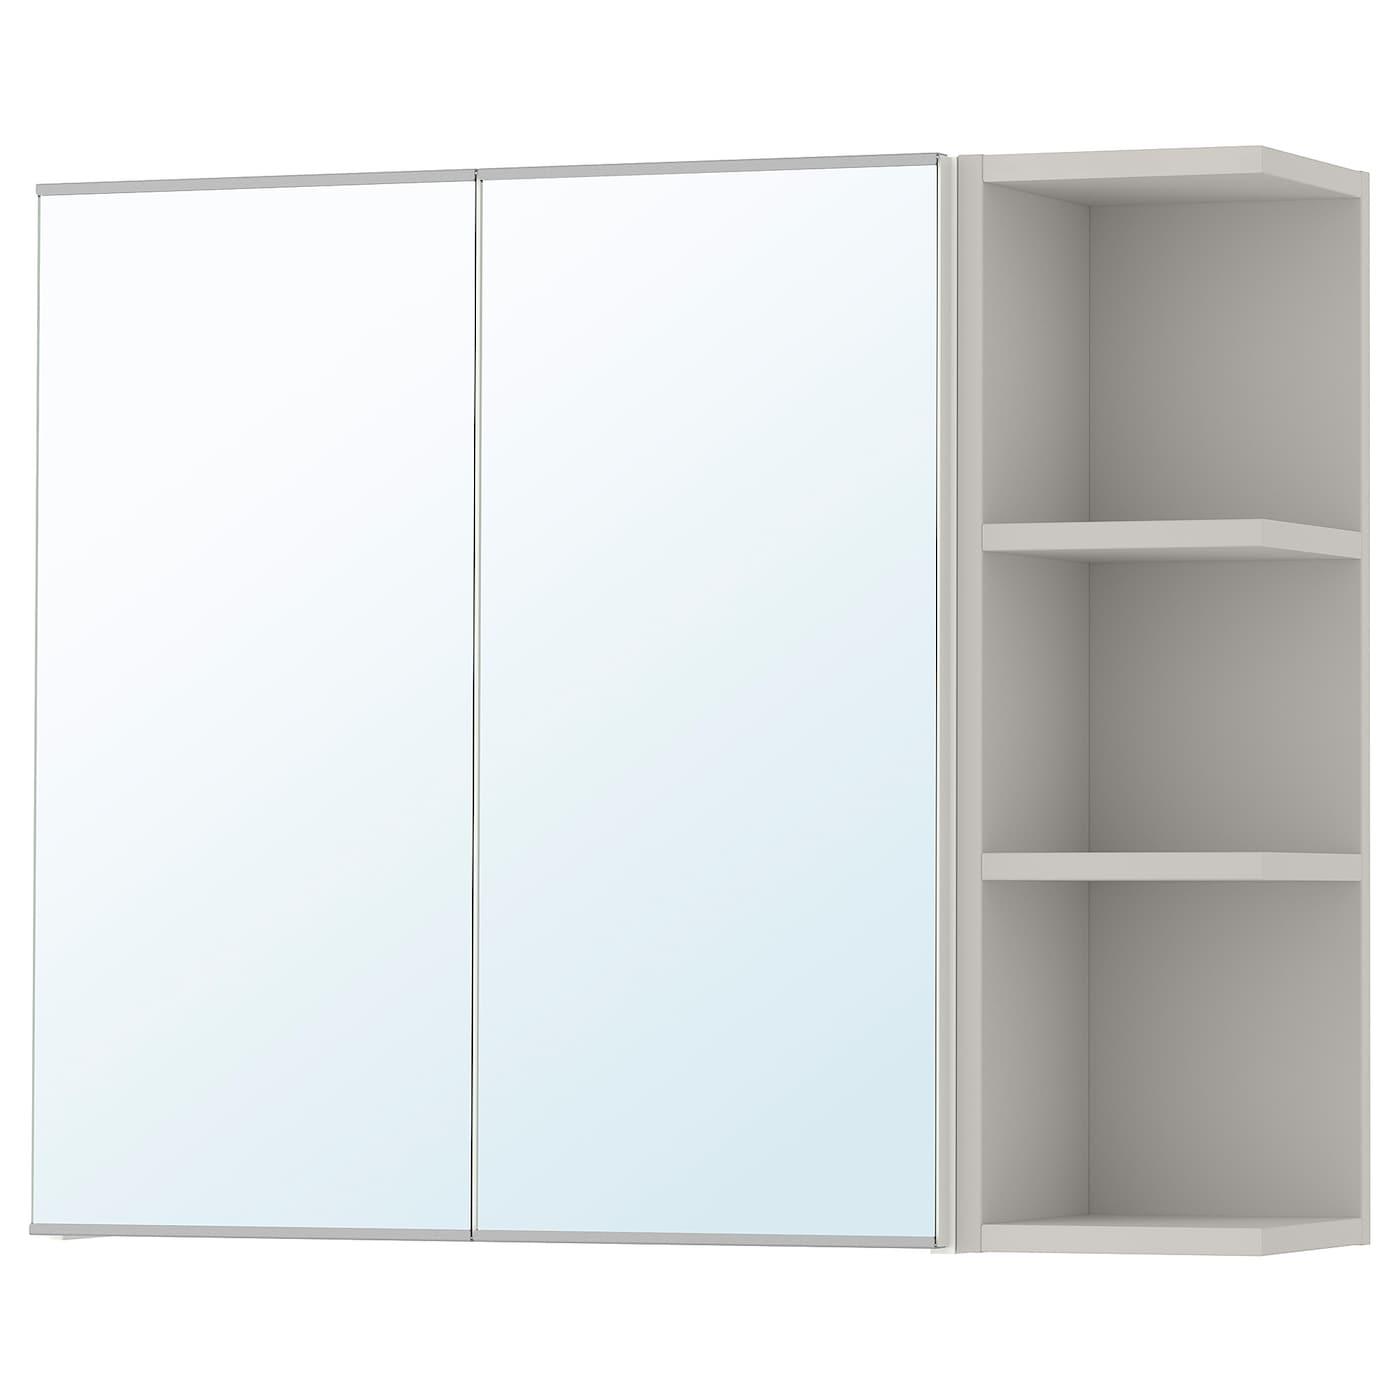 Ikea LillÅngen Mirror Cabinet 2 Doors 1 End Unit